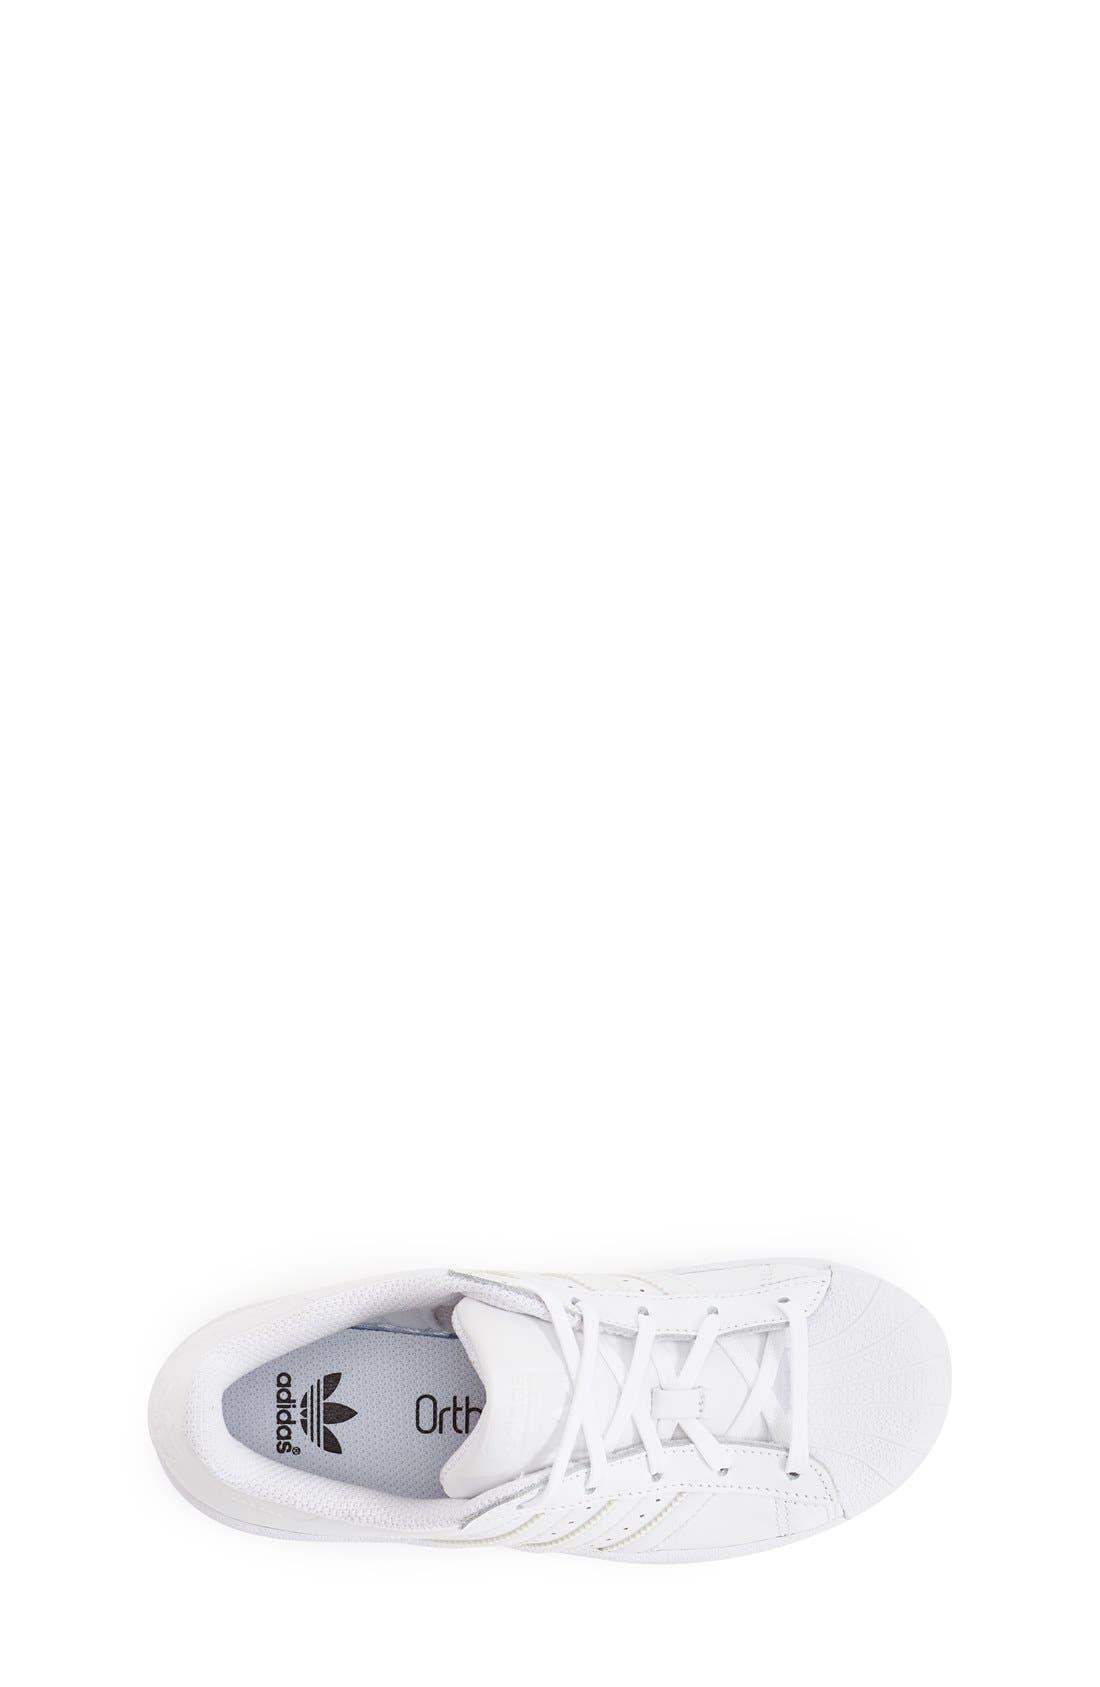 Alternate Image 3  - adidas 'Superstar' Sneaker (Toddler & Little Kid)